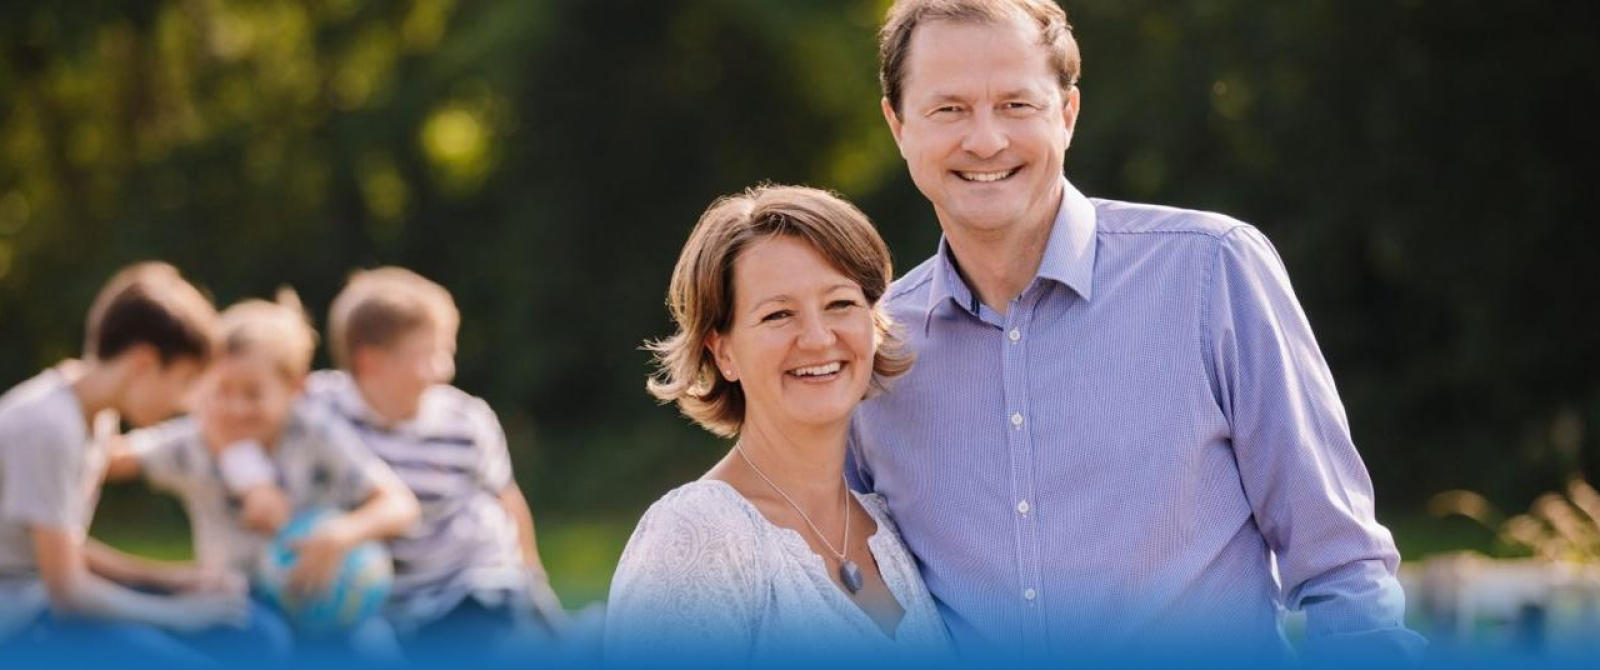 oliver-grundmann-stade-rotenburg-politiker-cdu-berlin-bundestag-mdb (10)